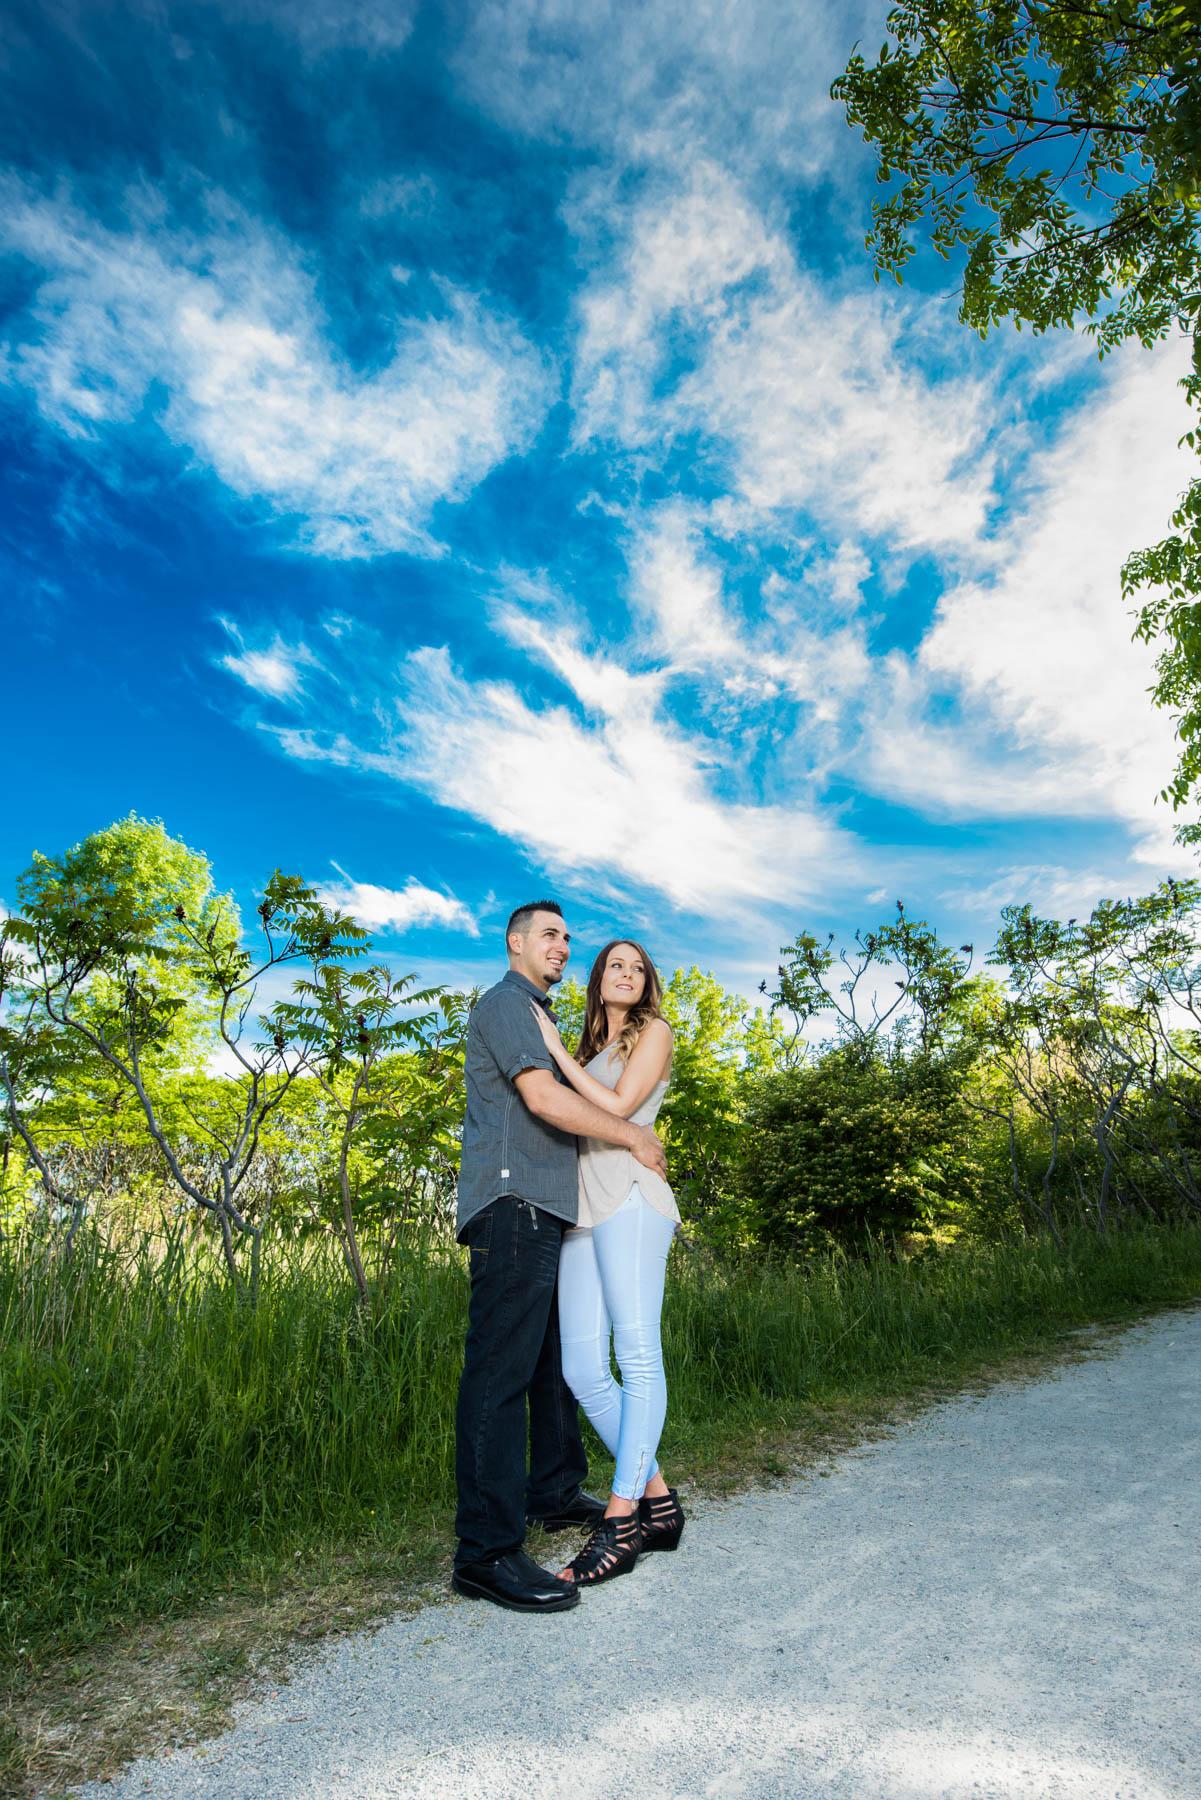 008 - Engagement CJ Humber Bay Park